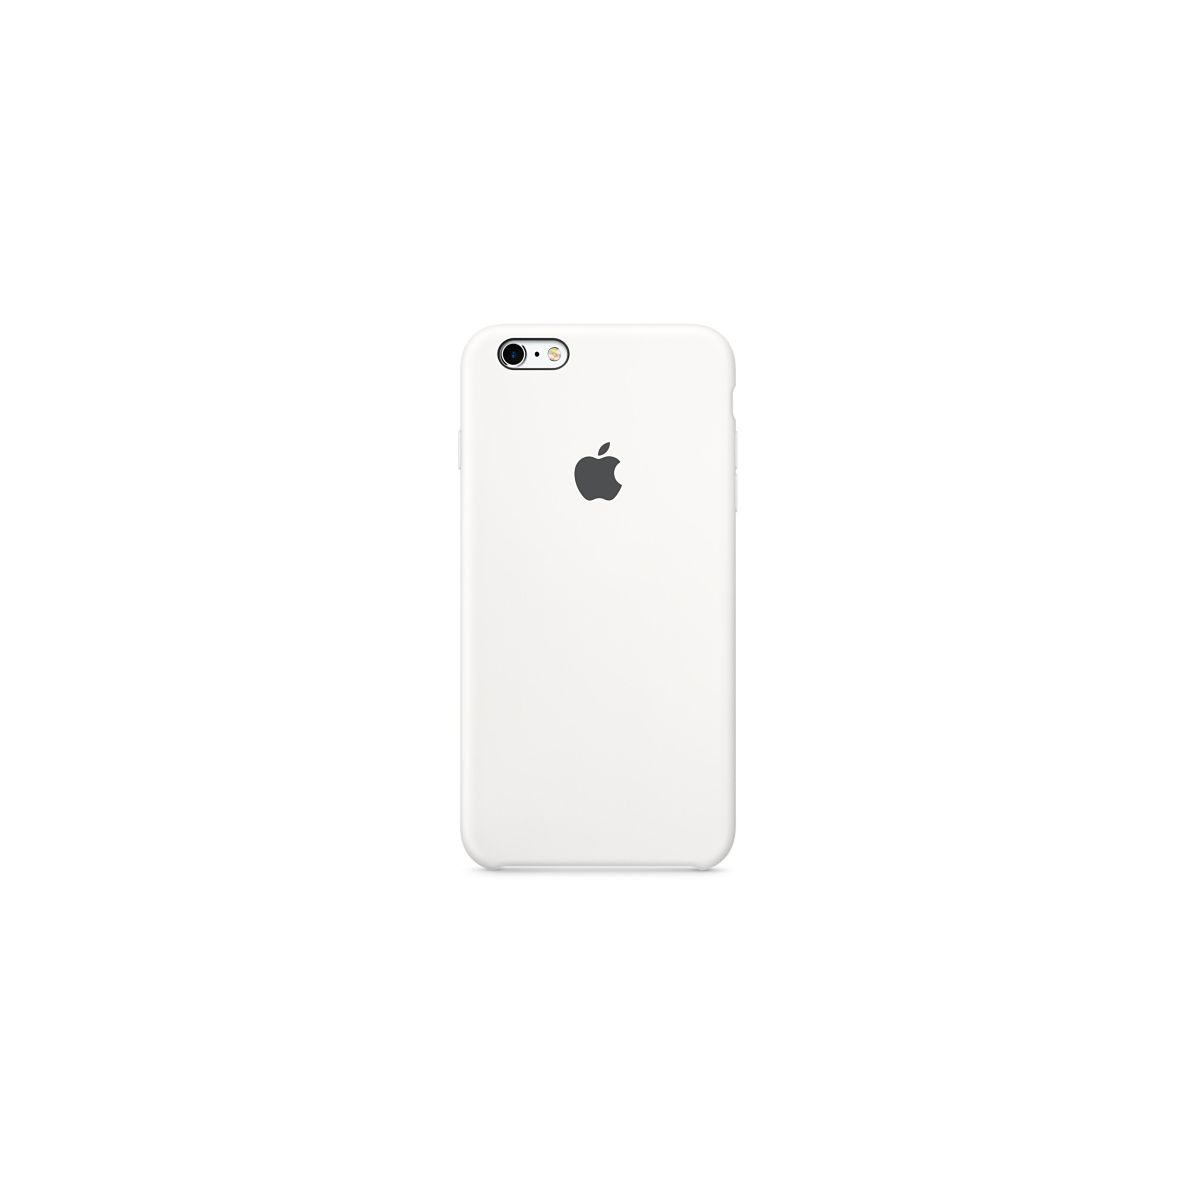 Coque APPLE iPhone 6/6S Plus silicone bl (photo)